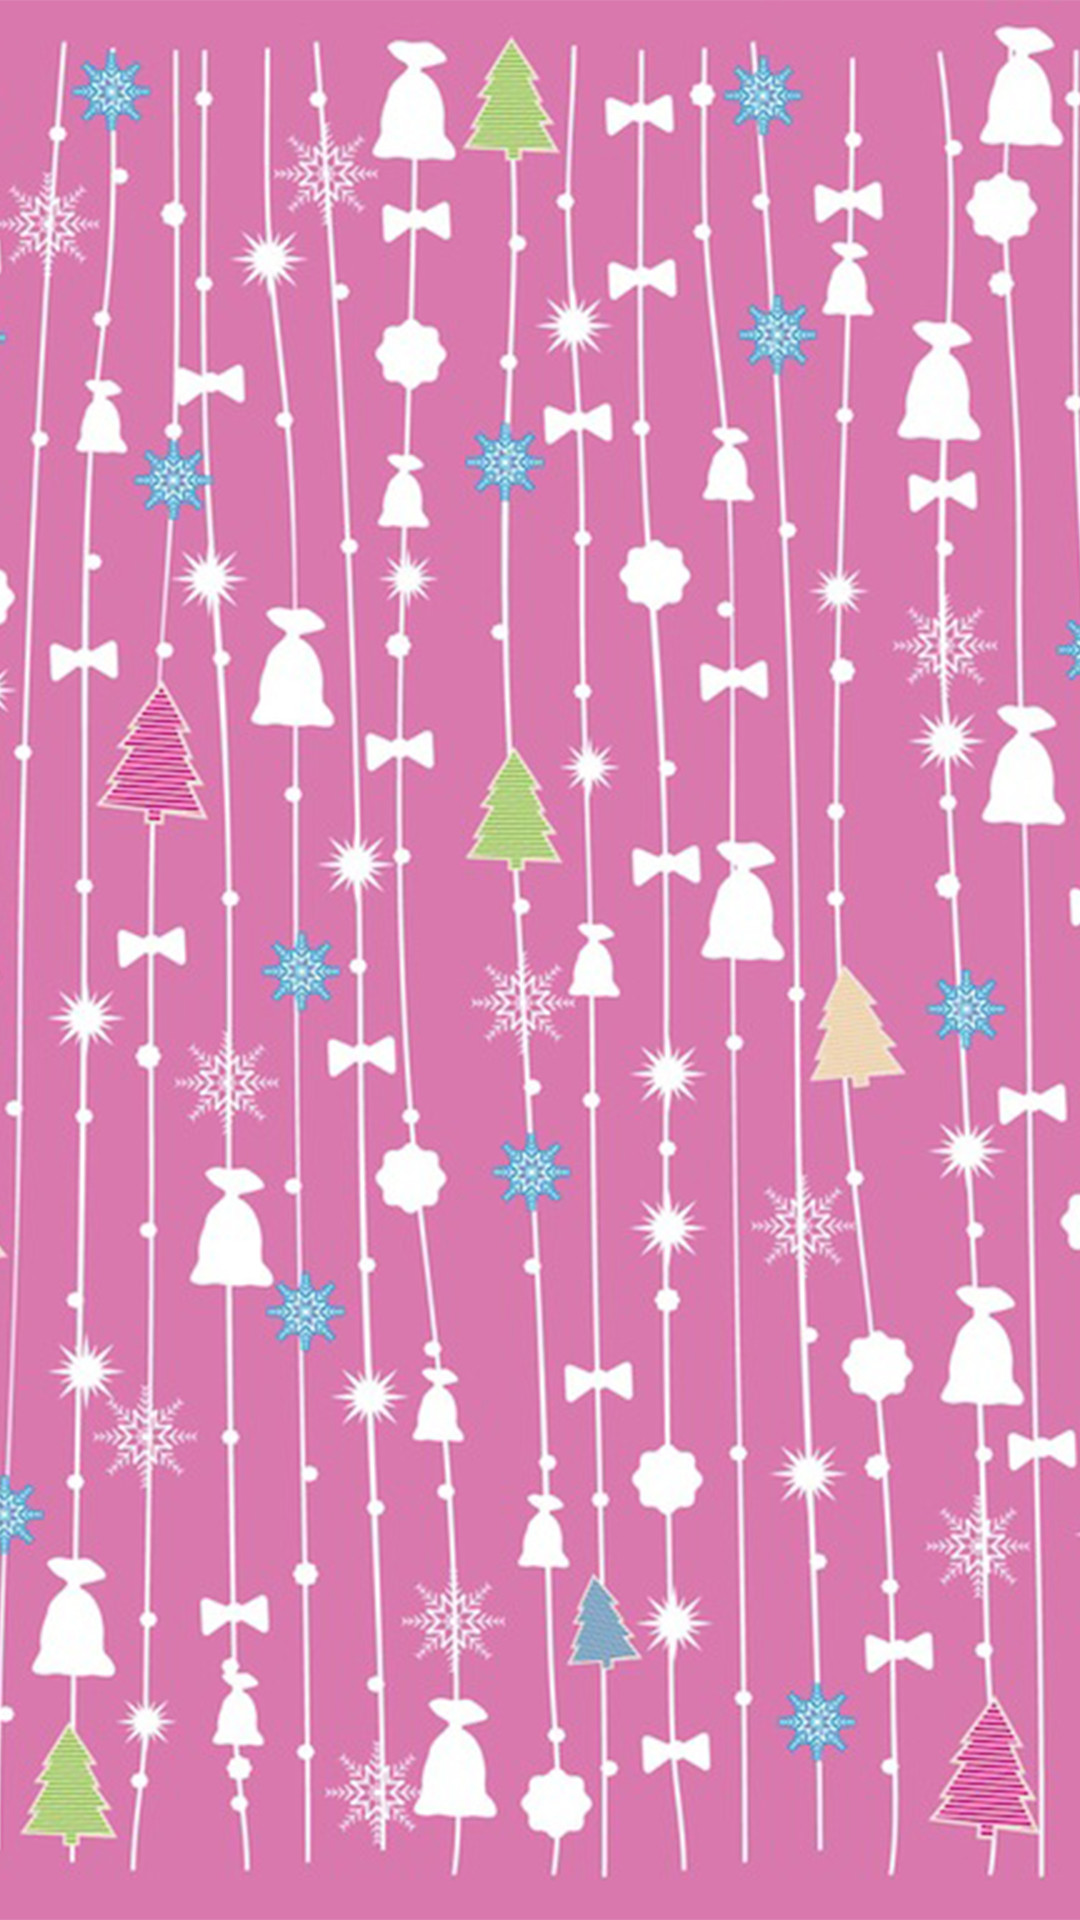 Wallpaper-Christmas-iphone-6-Plus-by-Blackberyy-themes-